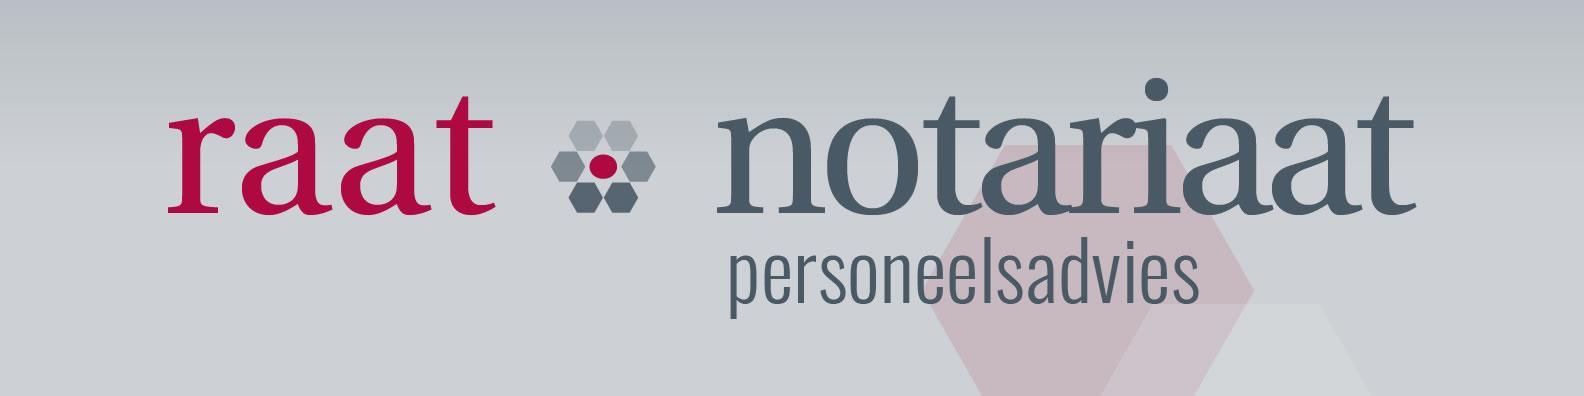 Kandidaat- notaris PFR 60- 100%